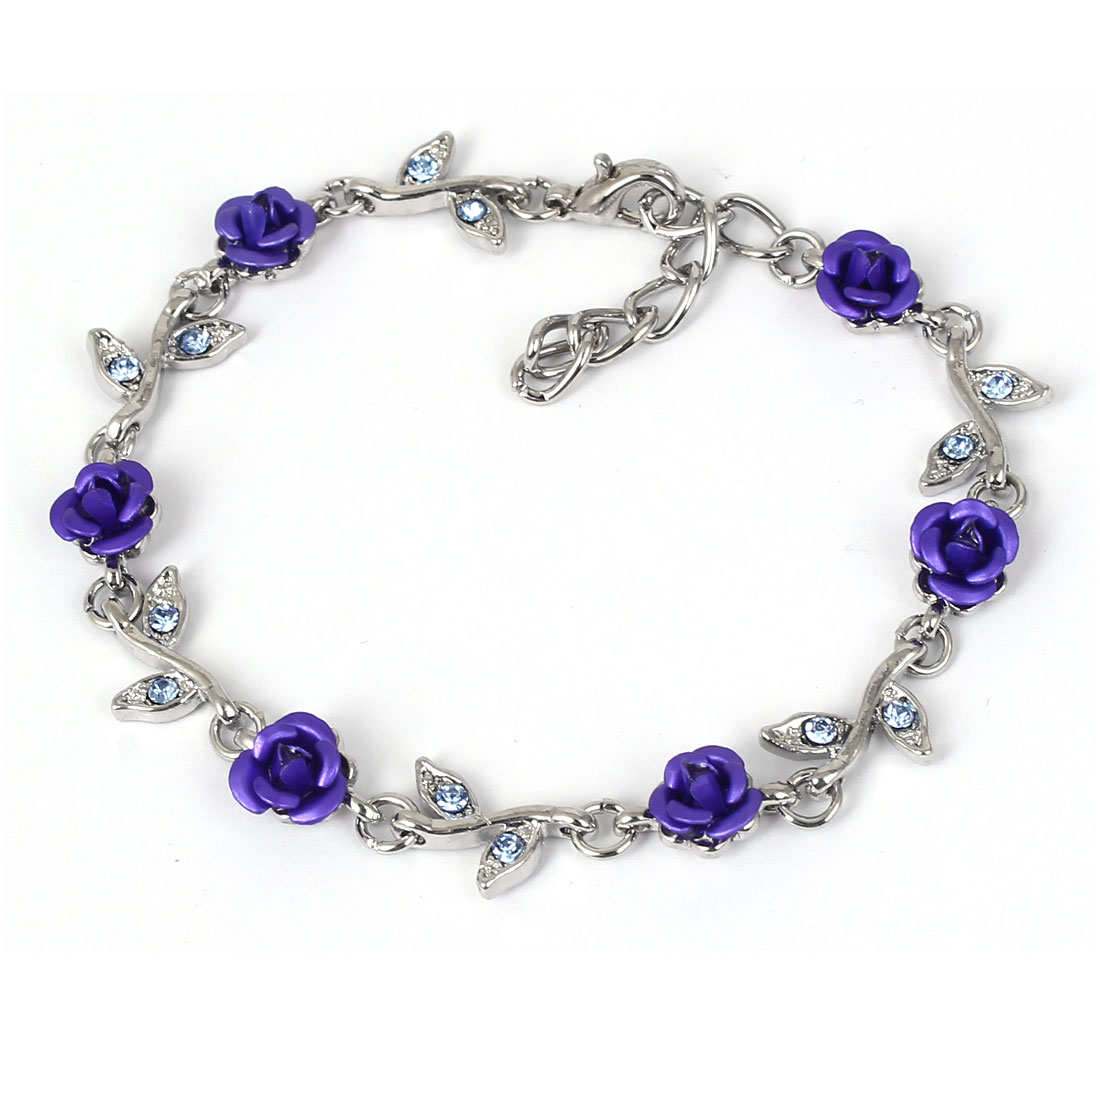 Lady Fashion Jewelry Rose Flower Crystal Decor Bracelet Silver Tone Royal Blue